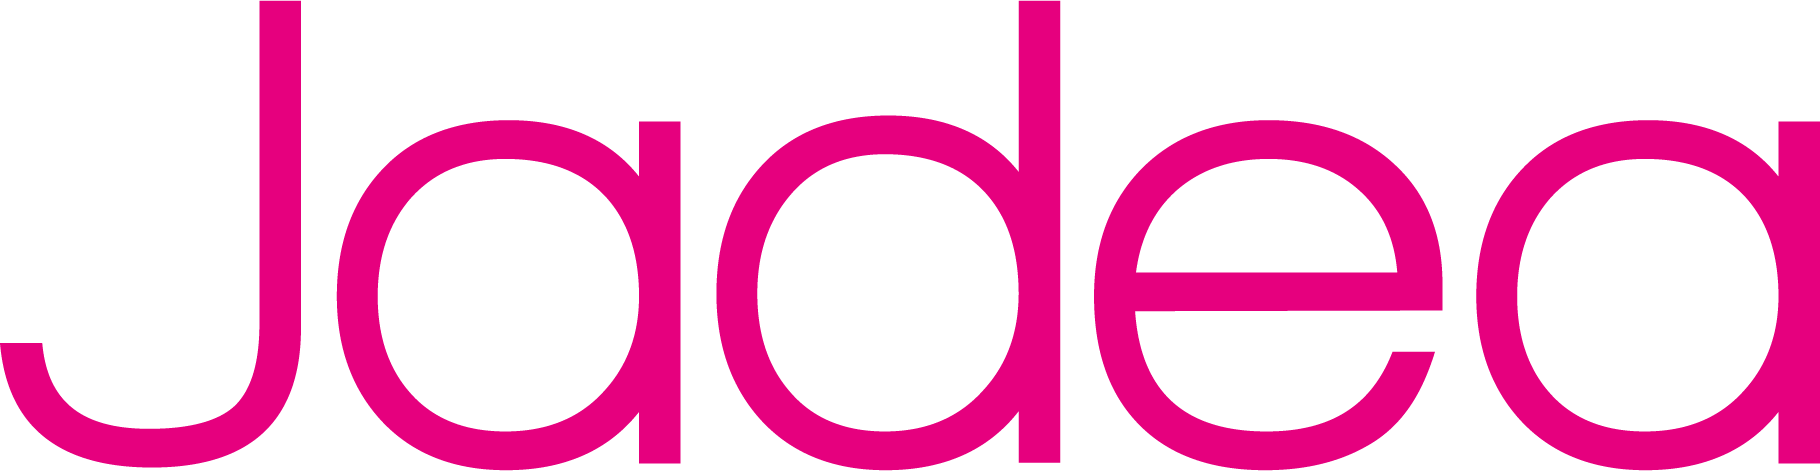 Intimo femminile Jadea - Testimonial: Belen Rodriguez | Jadea.it